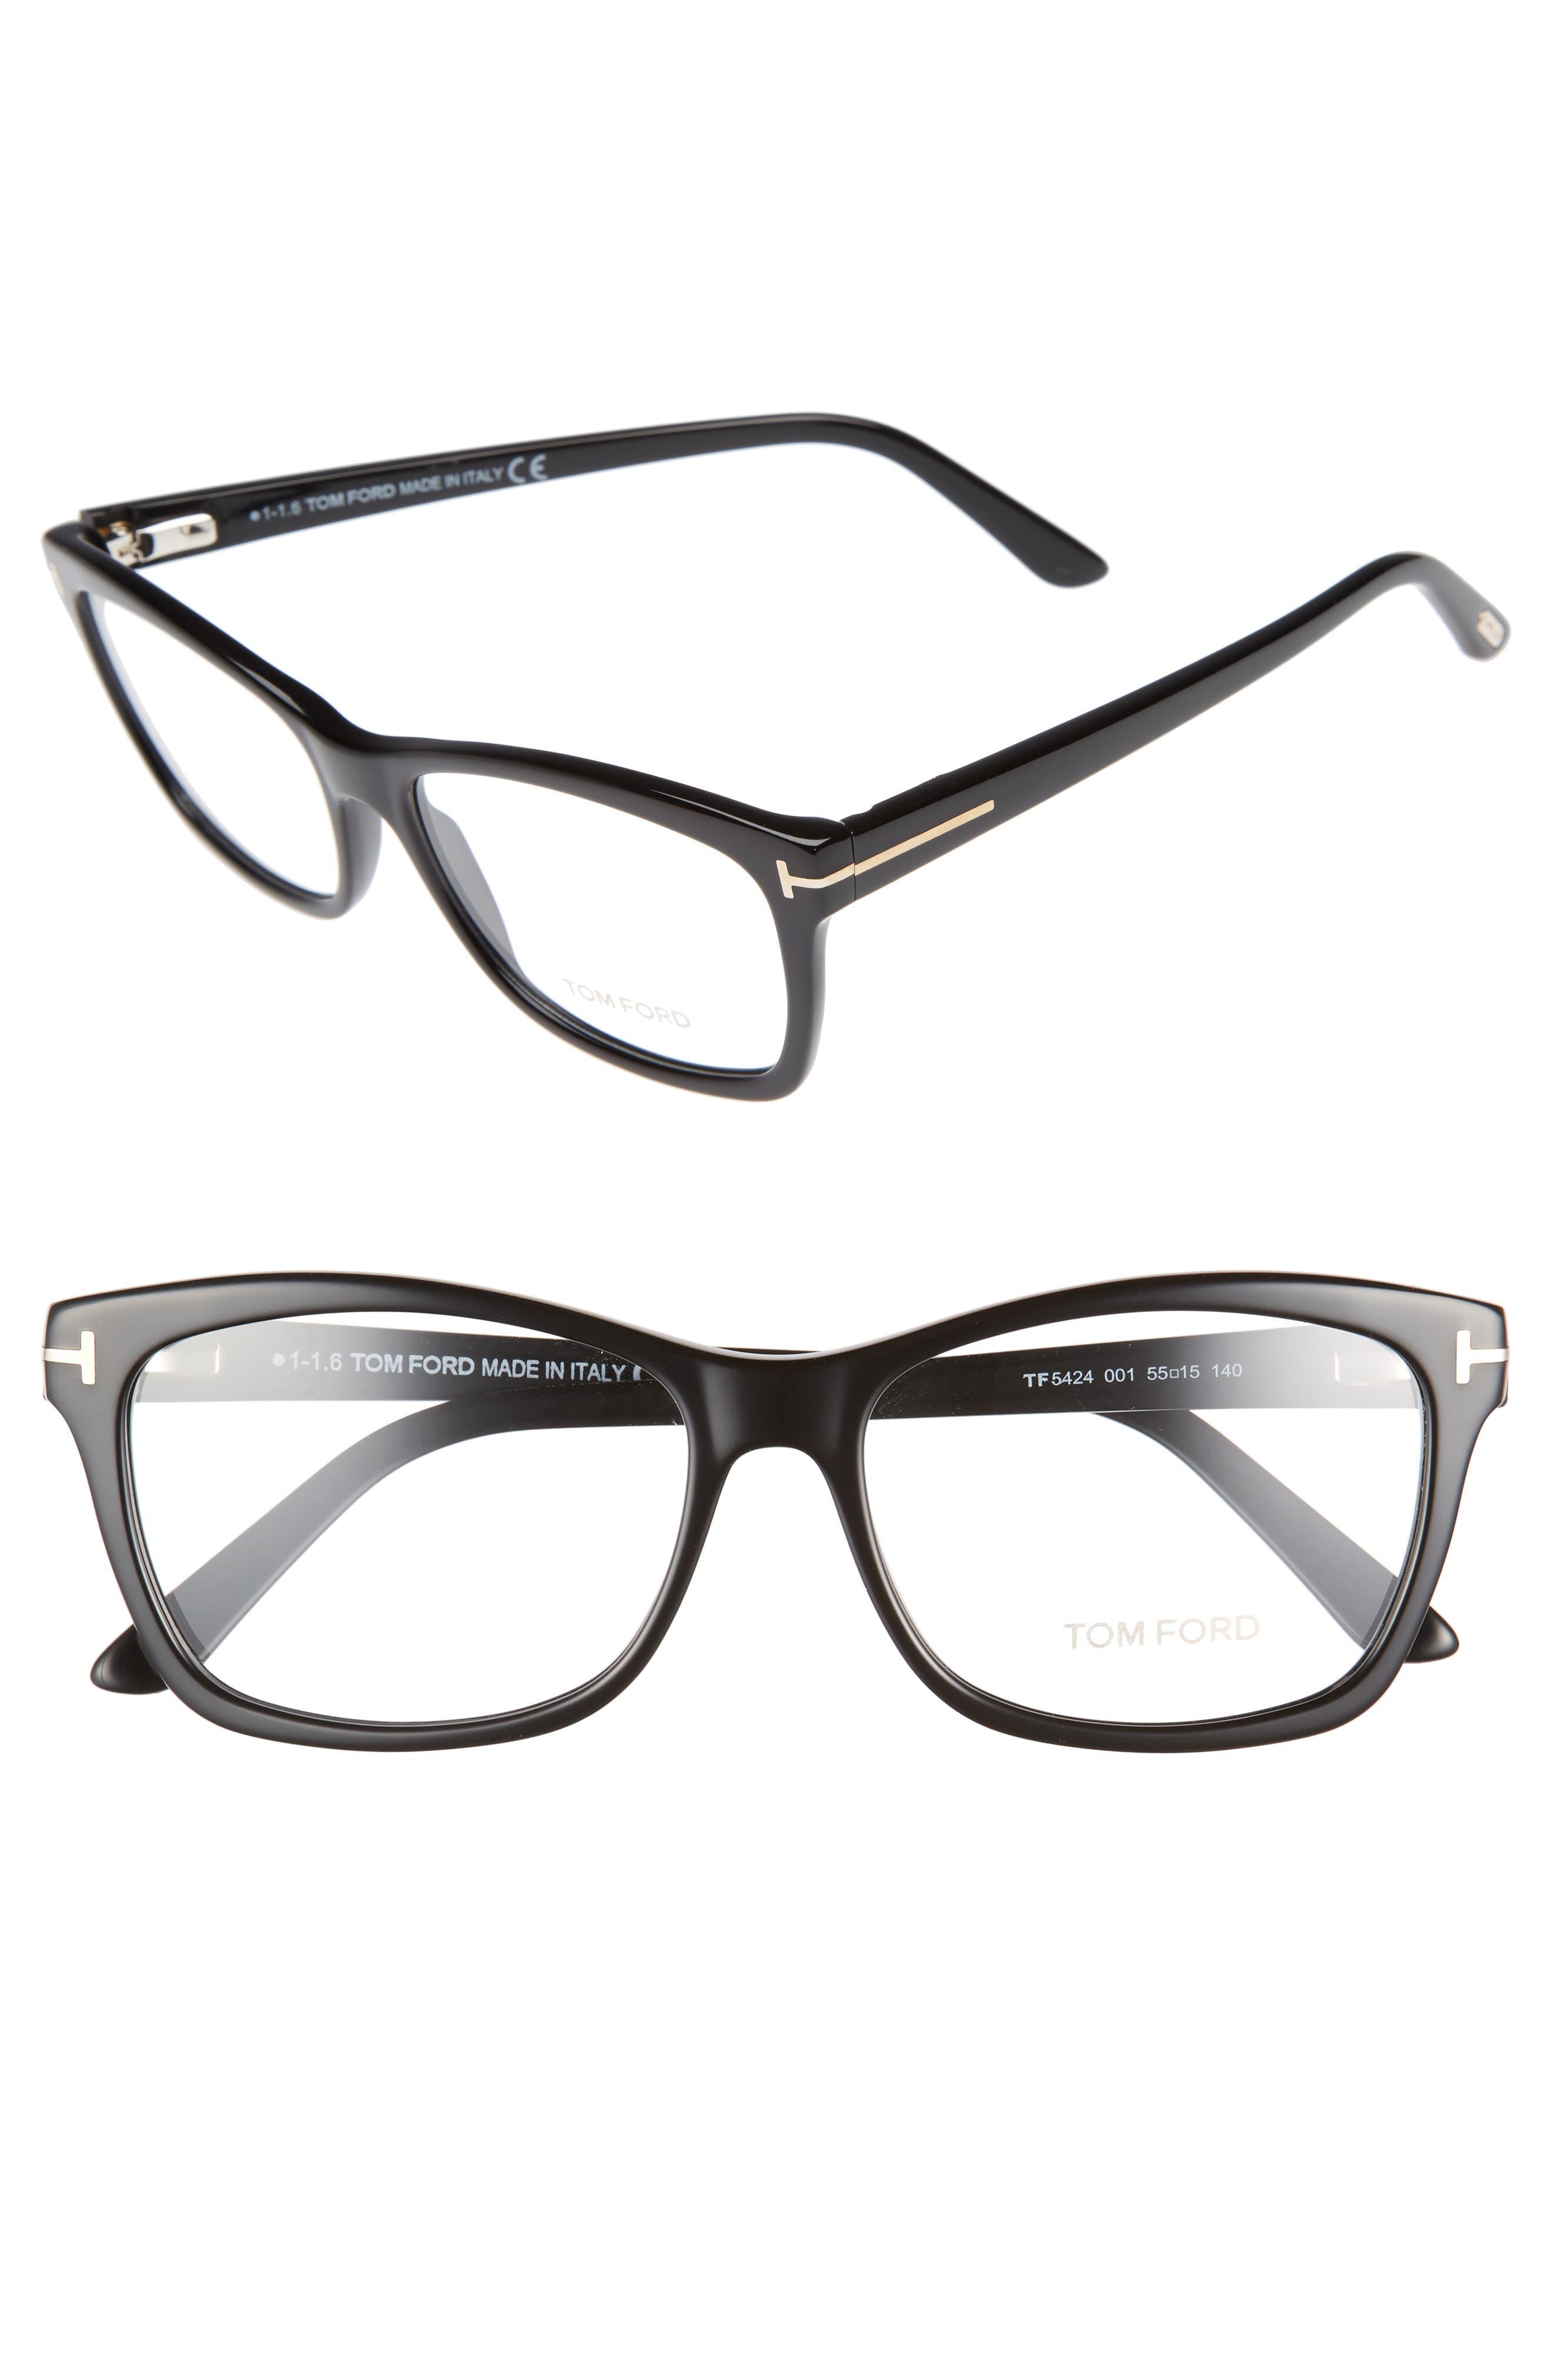 949f47cc744 Tom Ford 55Mm Optical Frames - Shiny Black